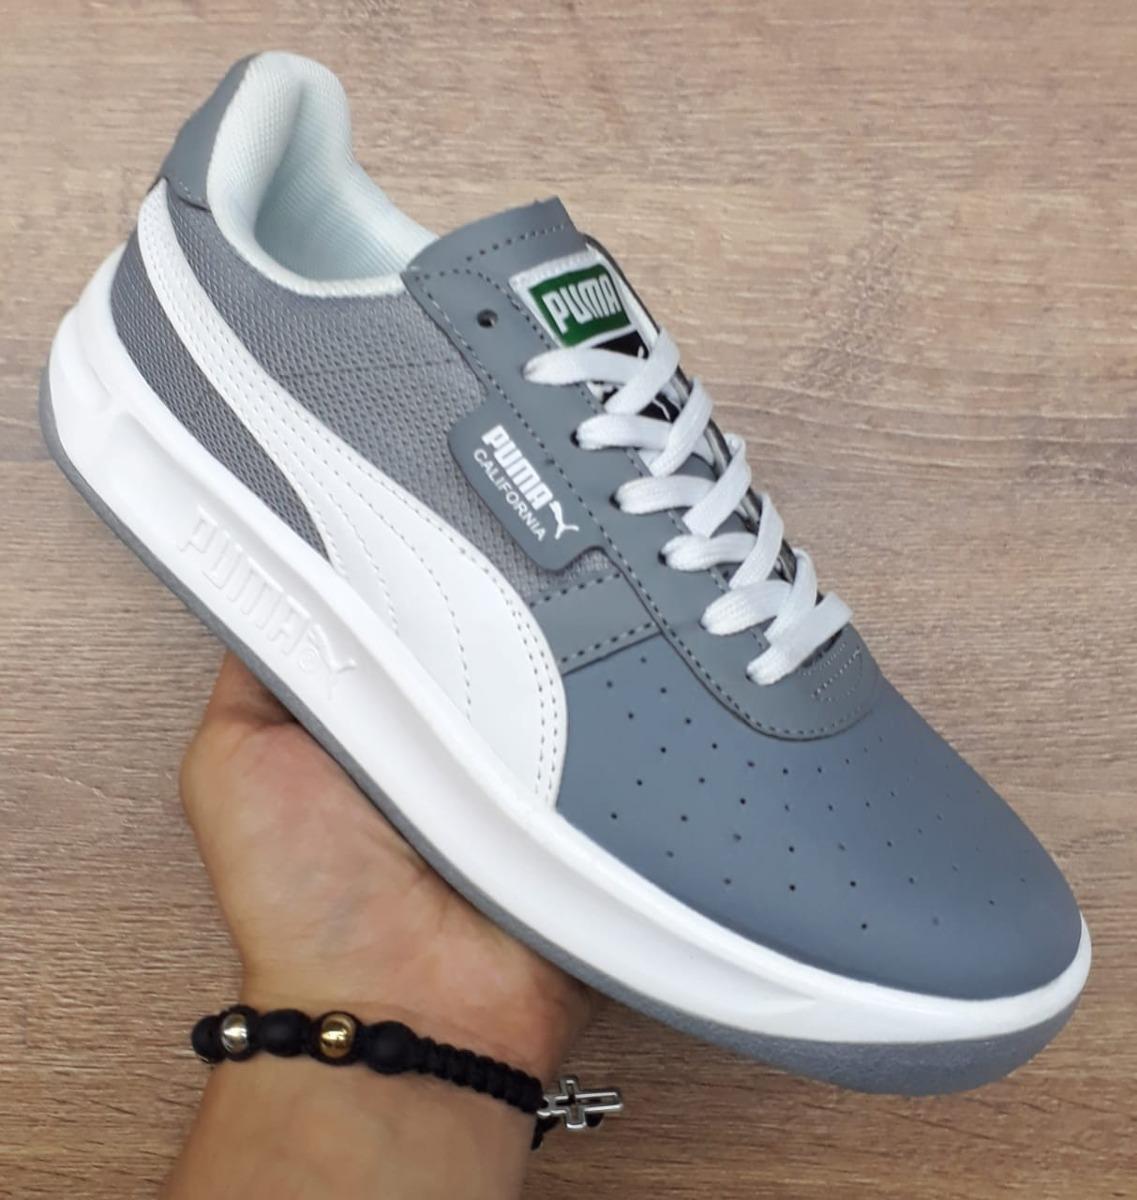 Envio Gratis Suela Alta Tenis California Zy1 Adidas Hombre wqOSxEpEXY